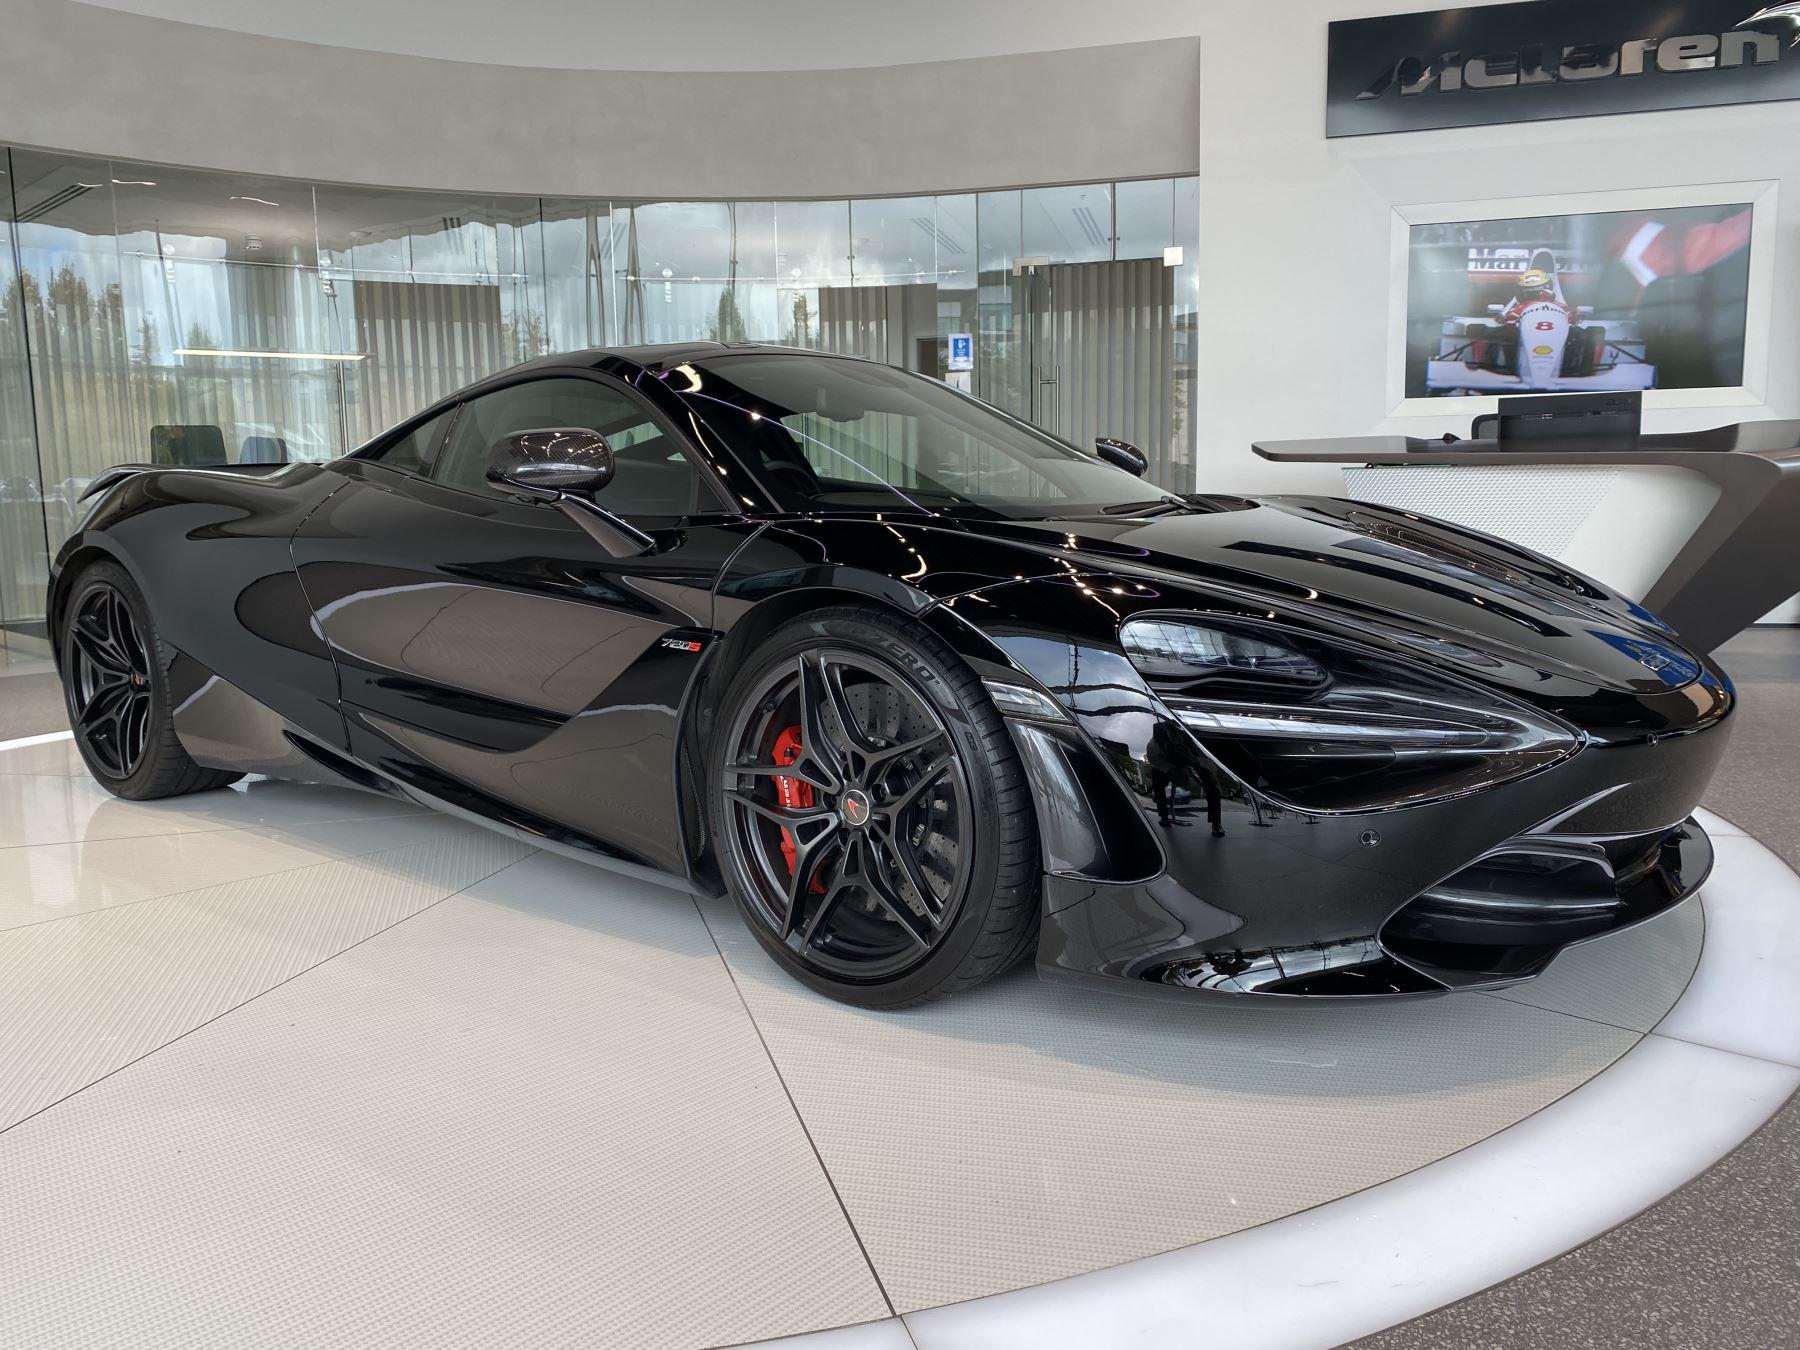 McLaren 720S V8 SSG PERFORMANCE SPEC, SPORTS EXHAUST 1 & 2 INTERIOR CARBON PACKS 4.0 Automatic 2 door Coupe